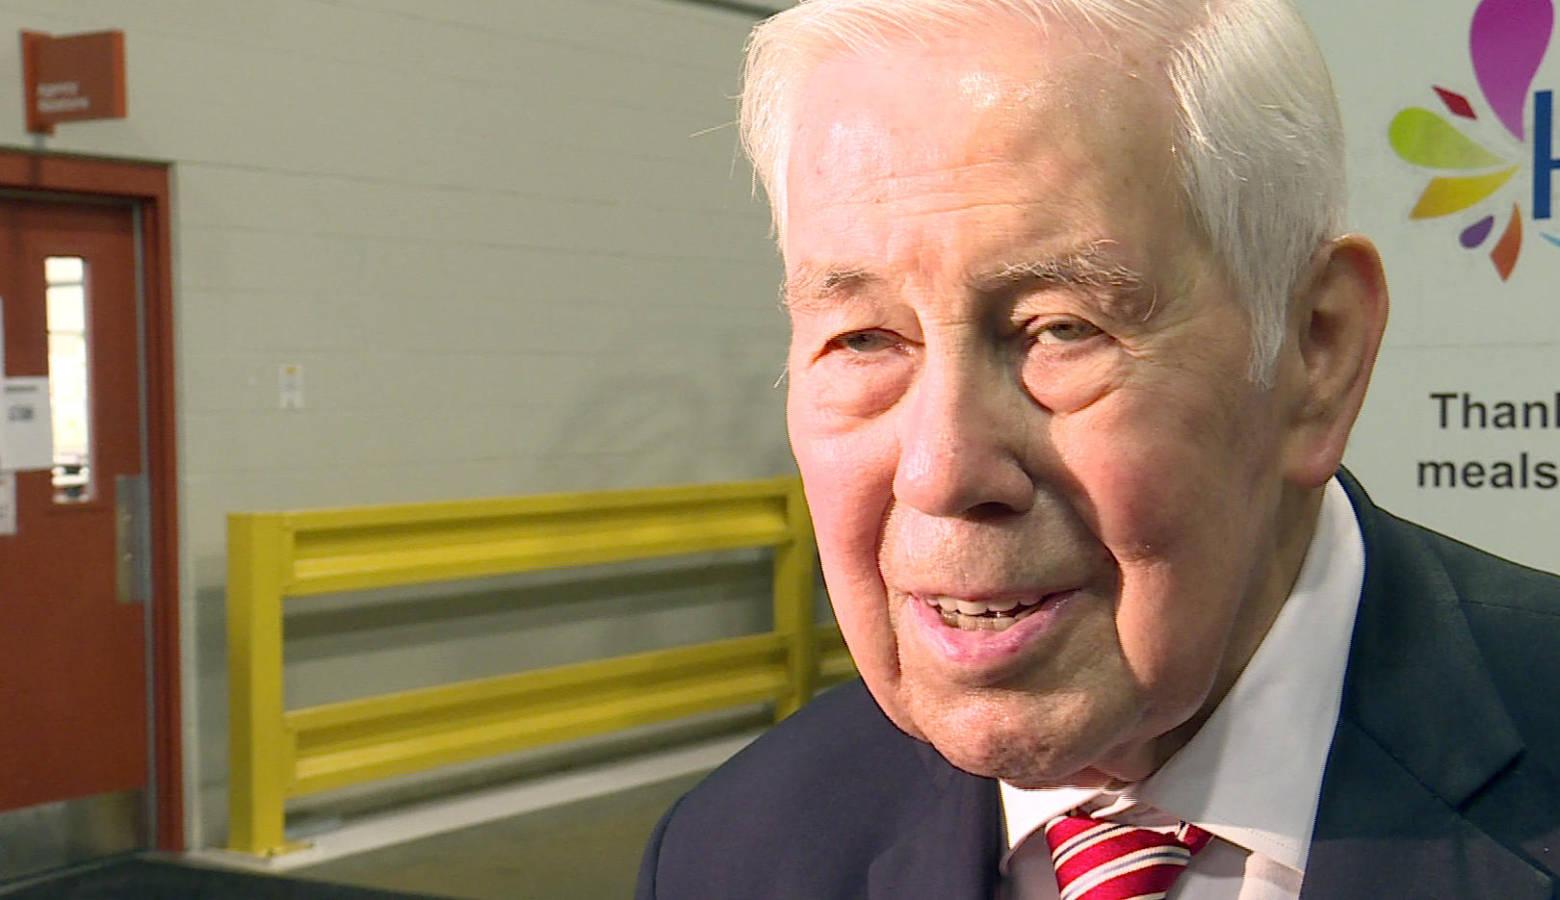 Former Sen. Richard Lugar (R-Ind.) passed away April 28. (Lauren Chapman/IPB News)